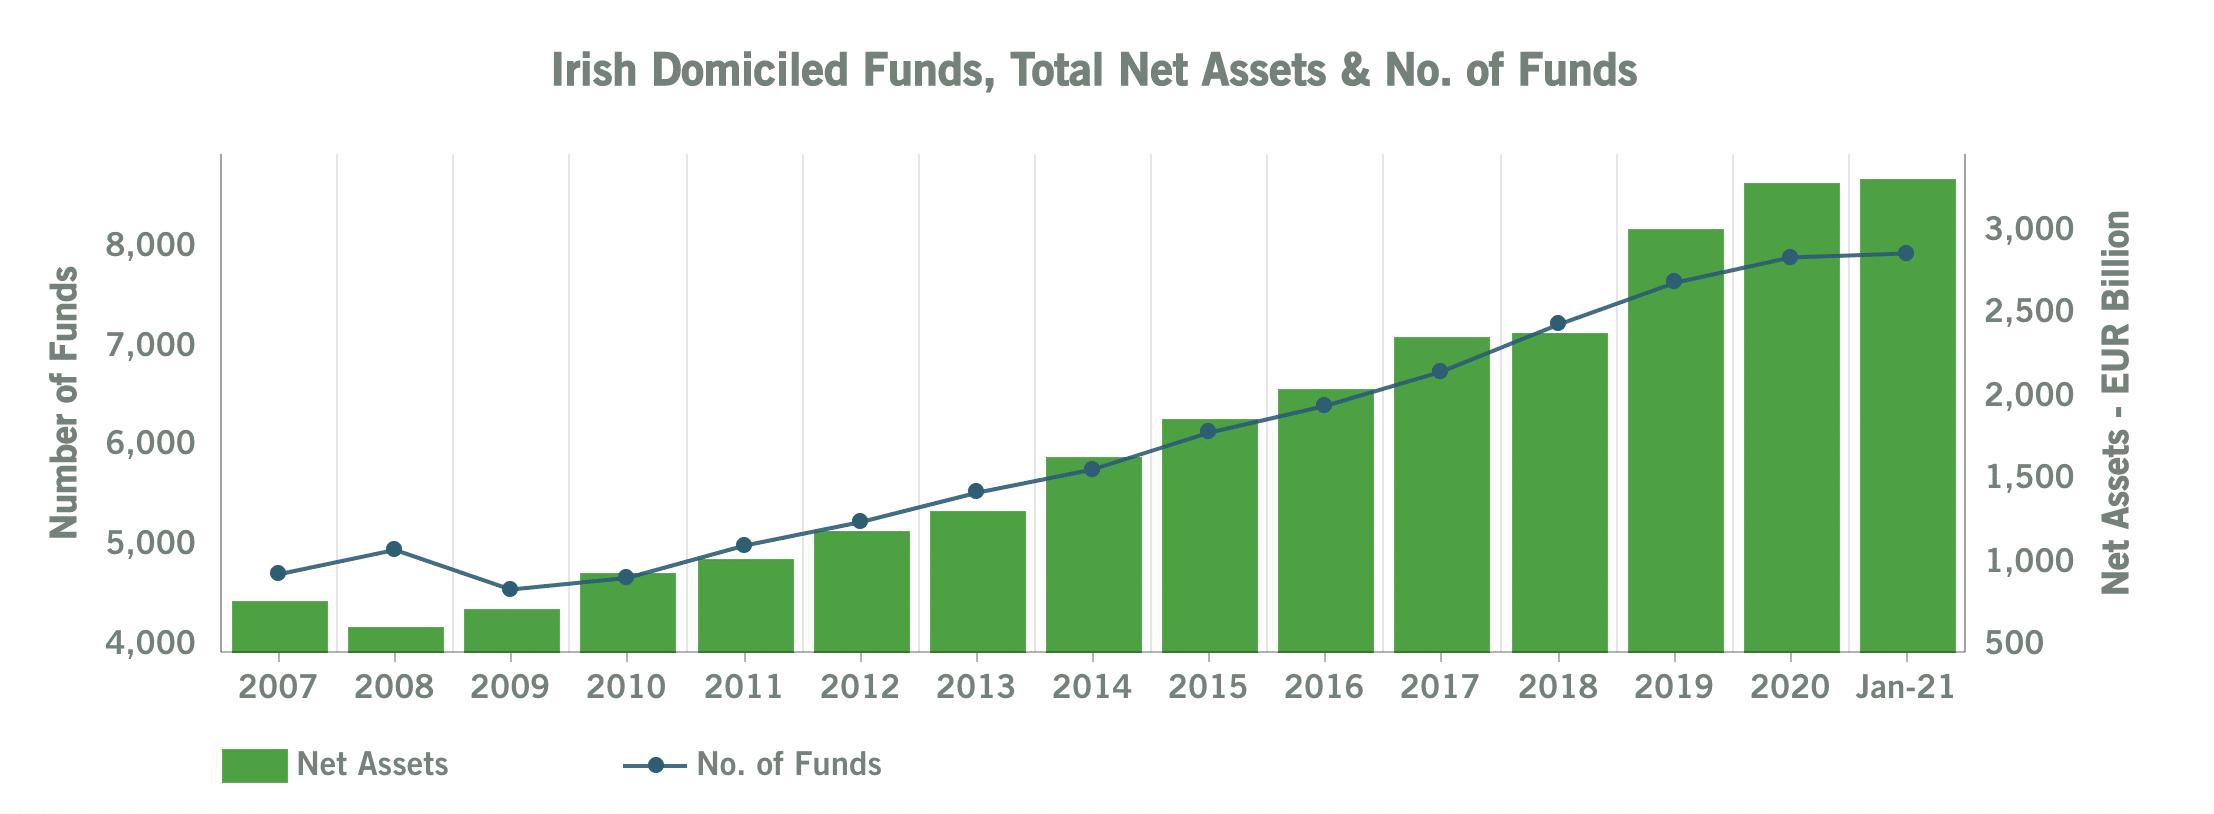 irish funds industry growth